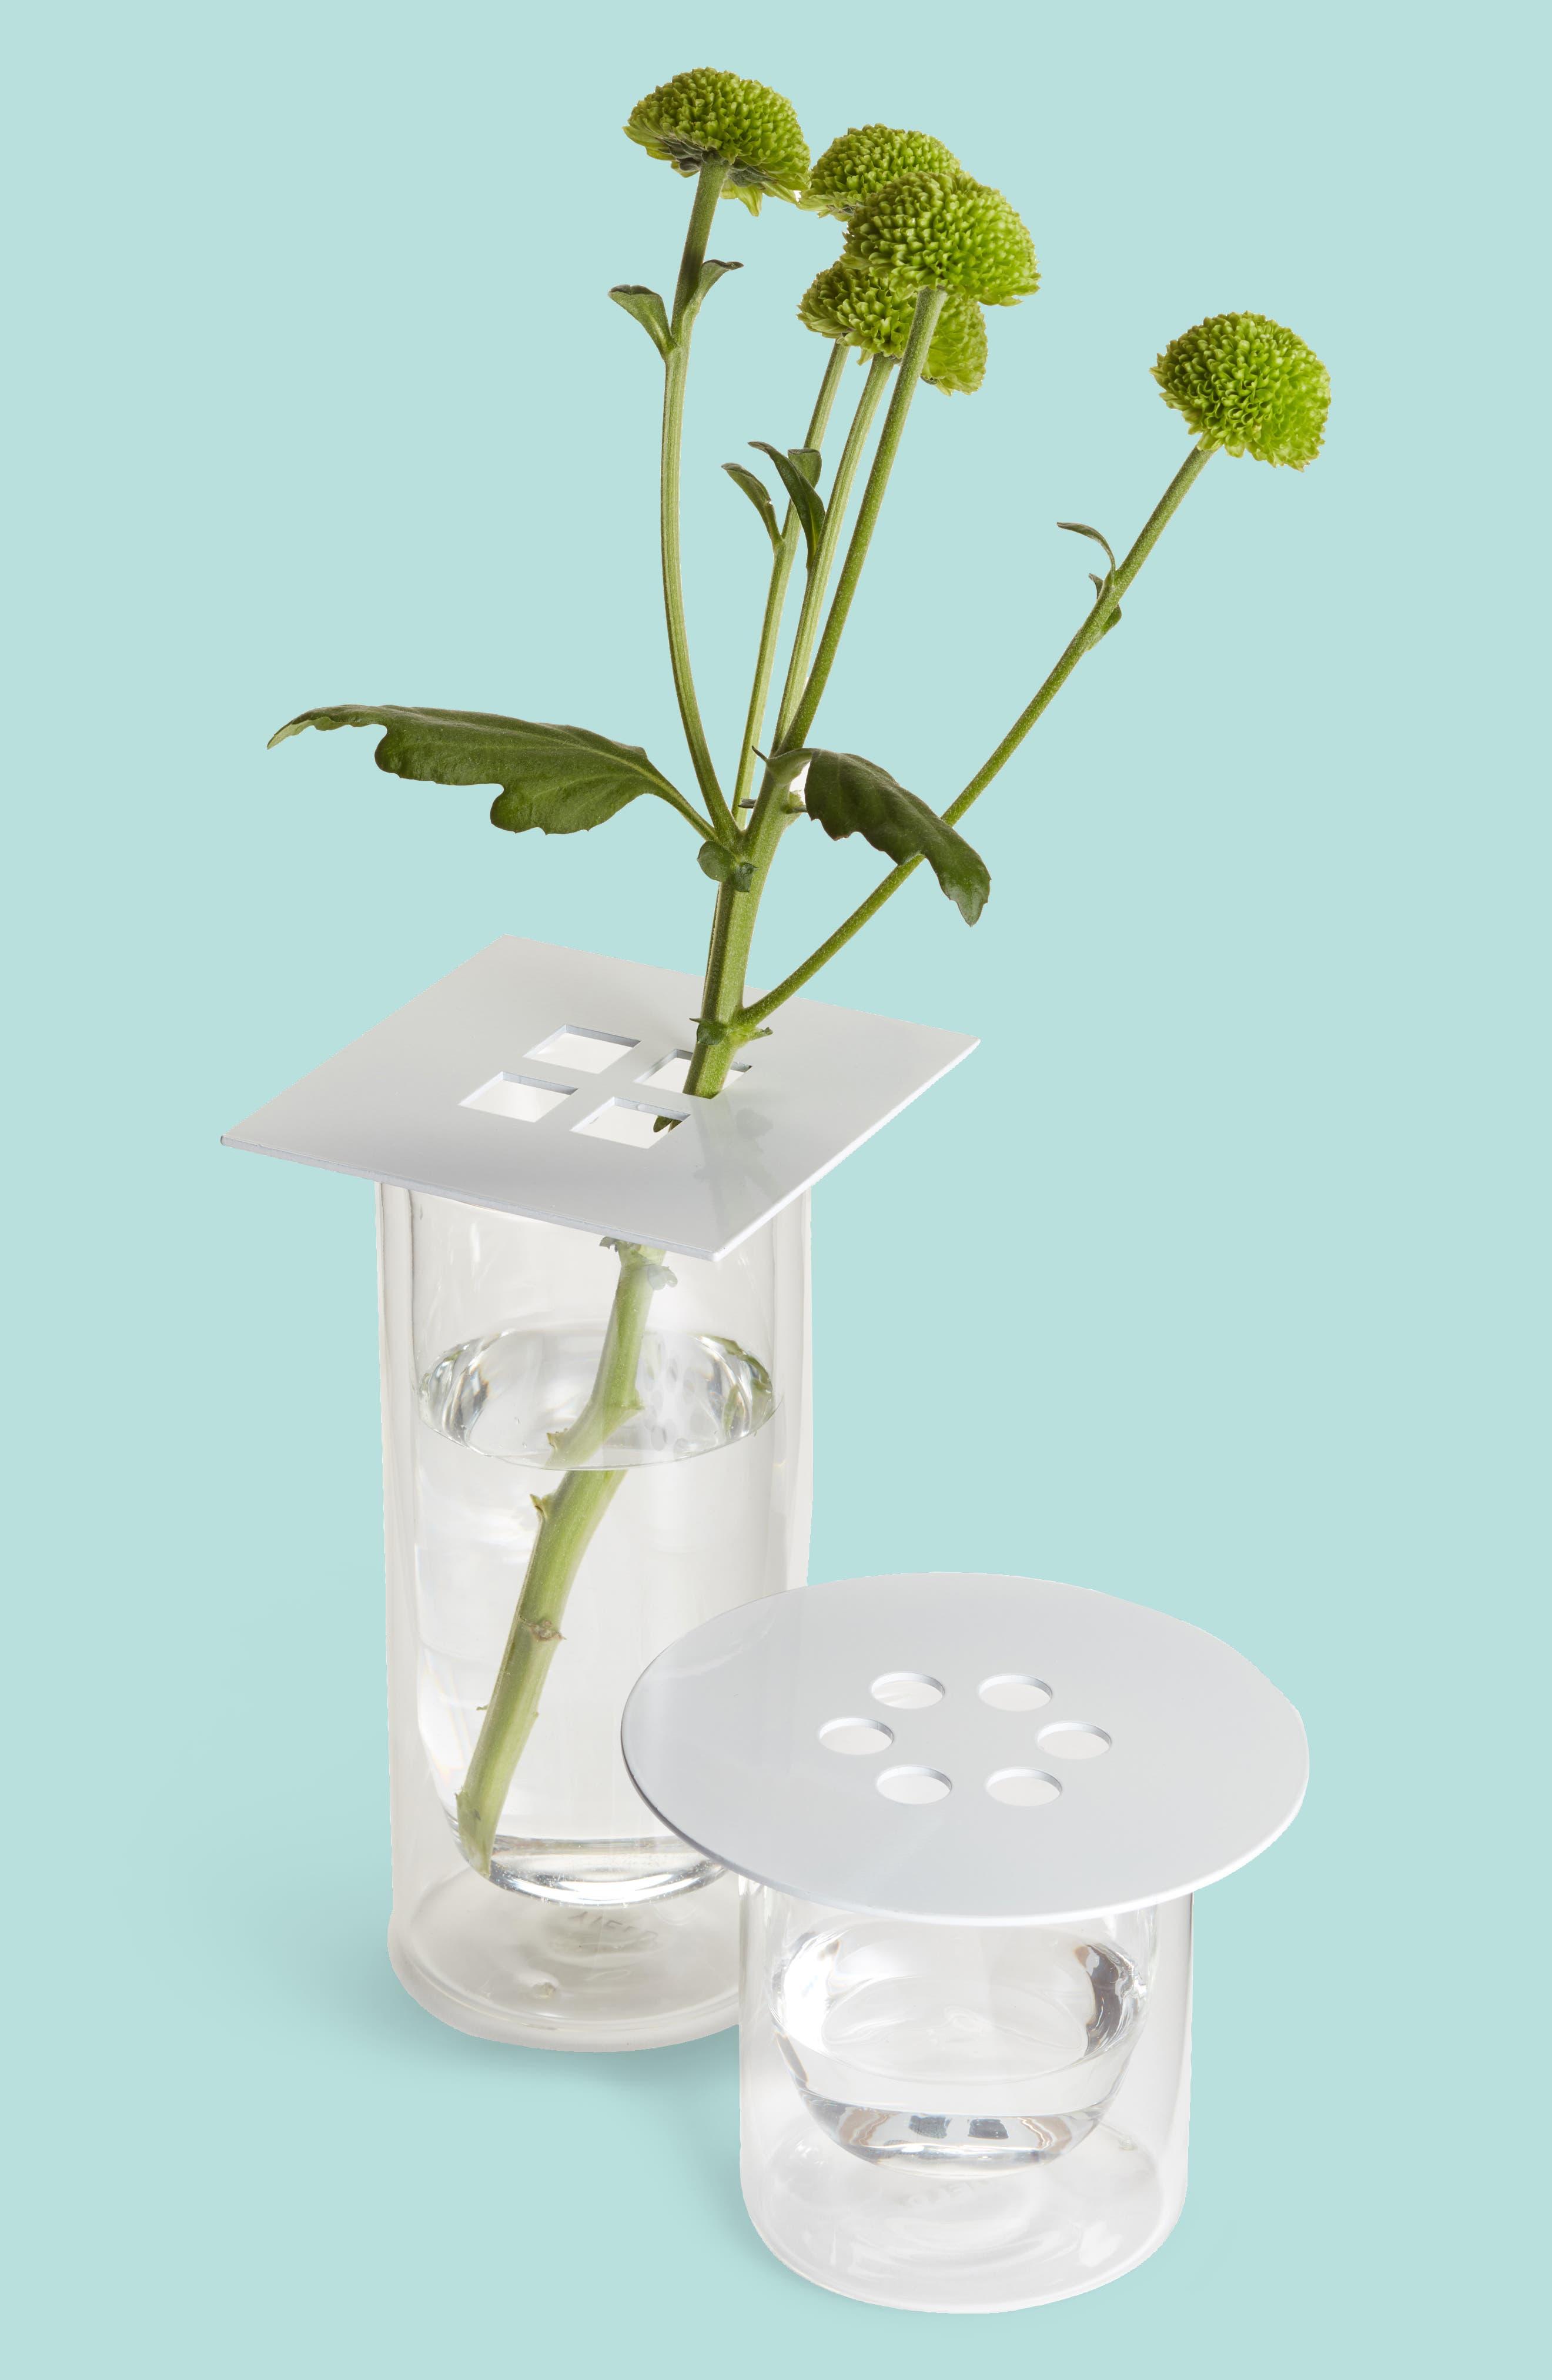 Set of 3 Anywhere Vase Converters,                             Main thumbnail 1, color,                             WHITE